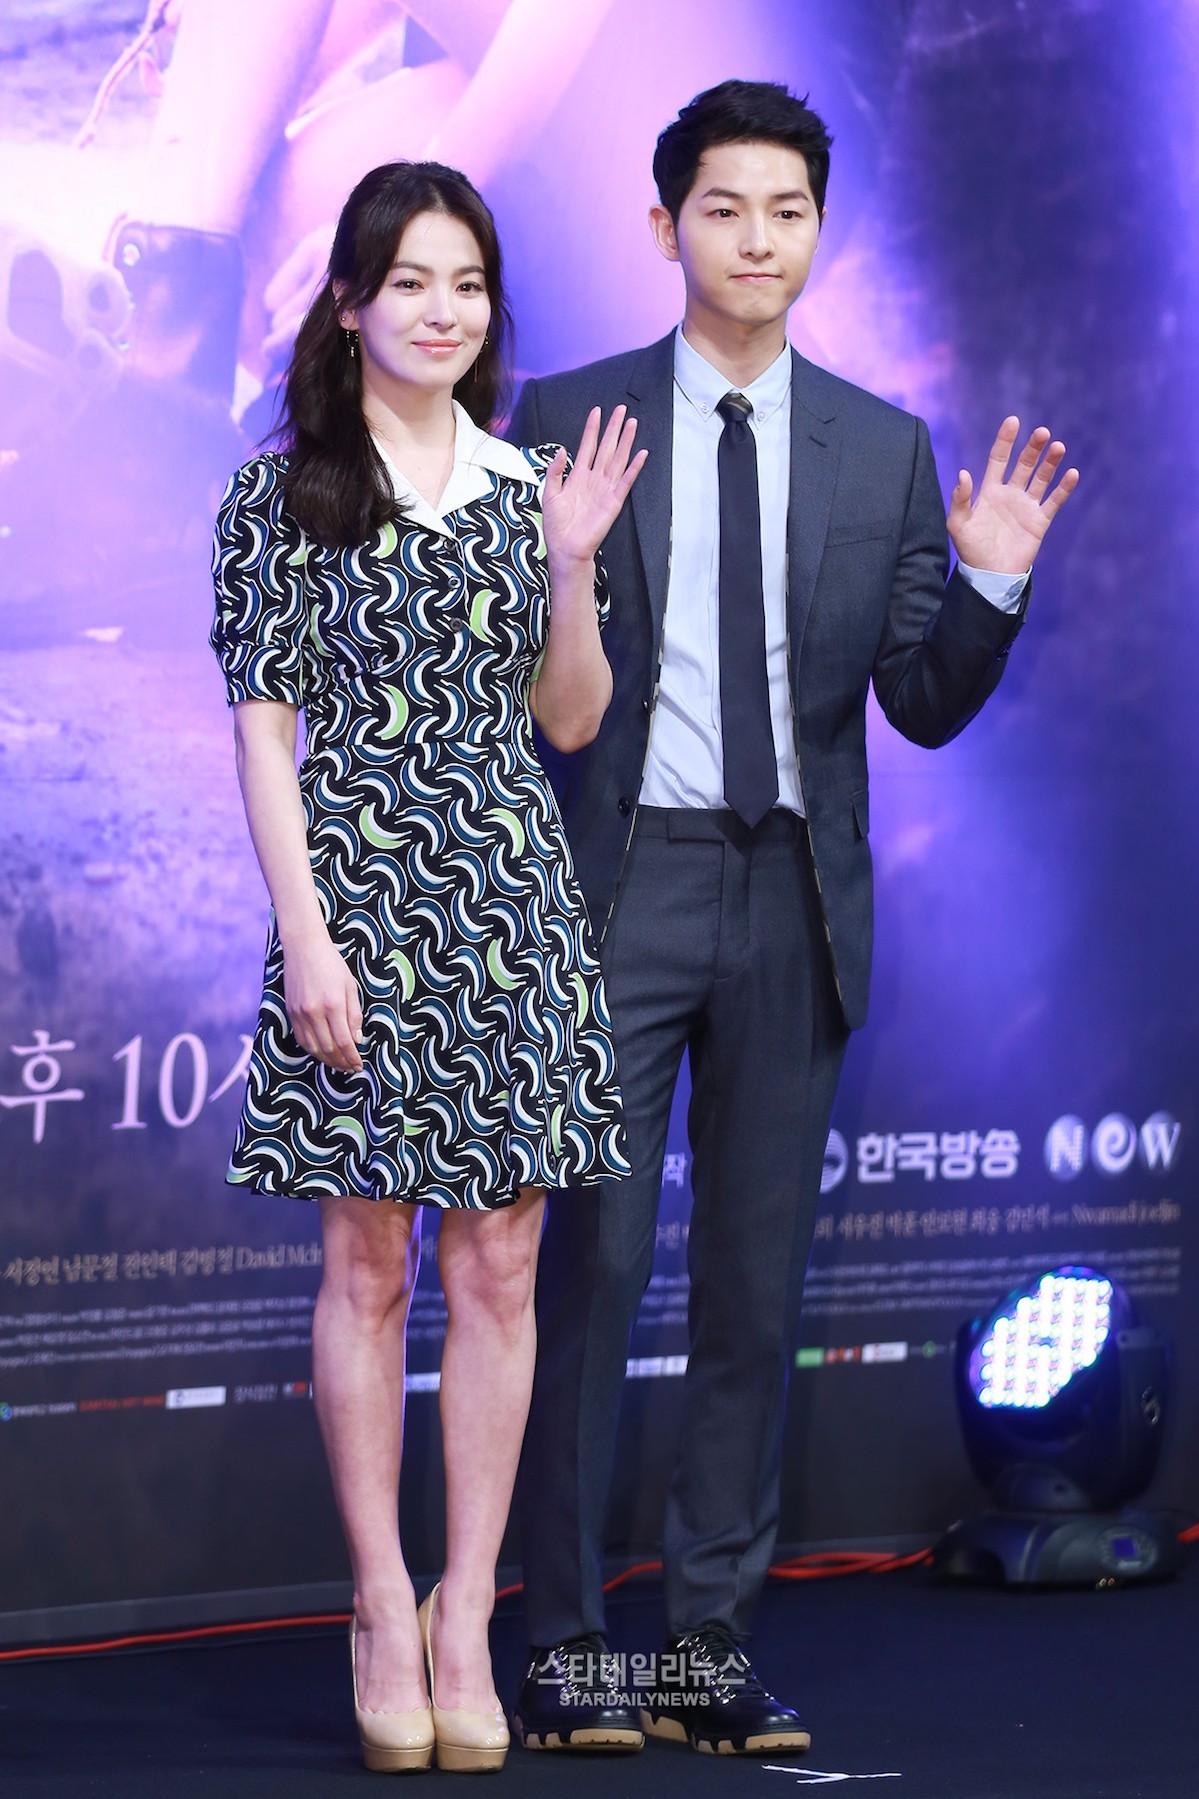 Song Joong Ki Dan Song Hye Kyo Promo Descendant Of The Sun JauhariNET